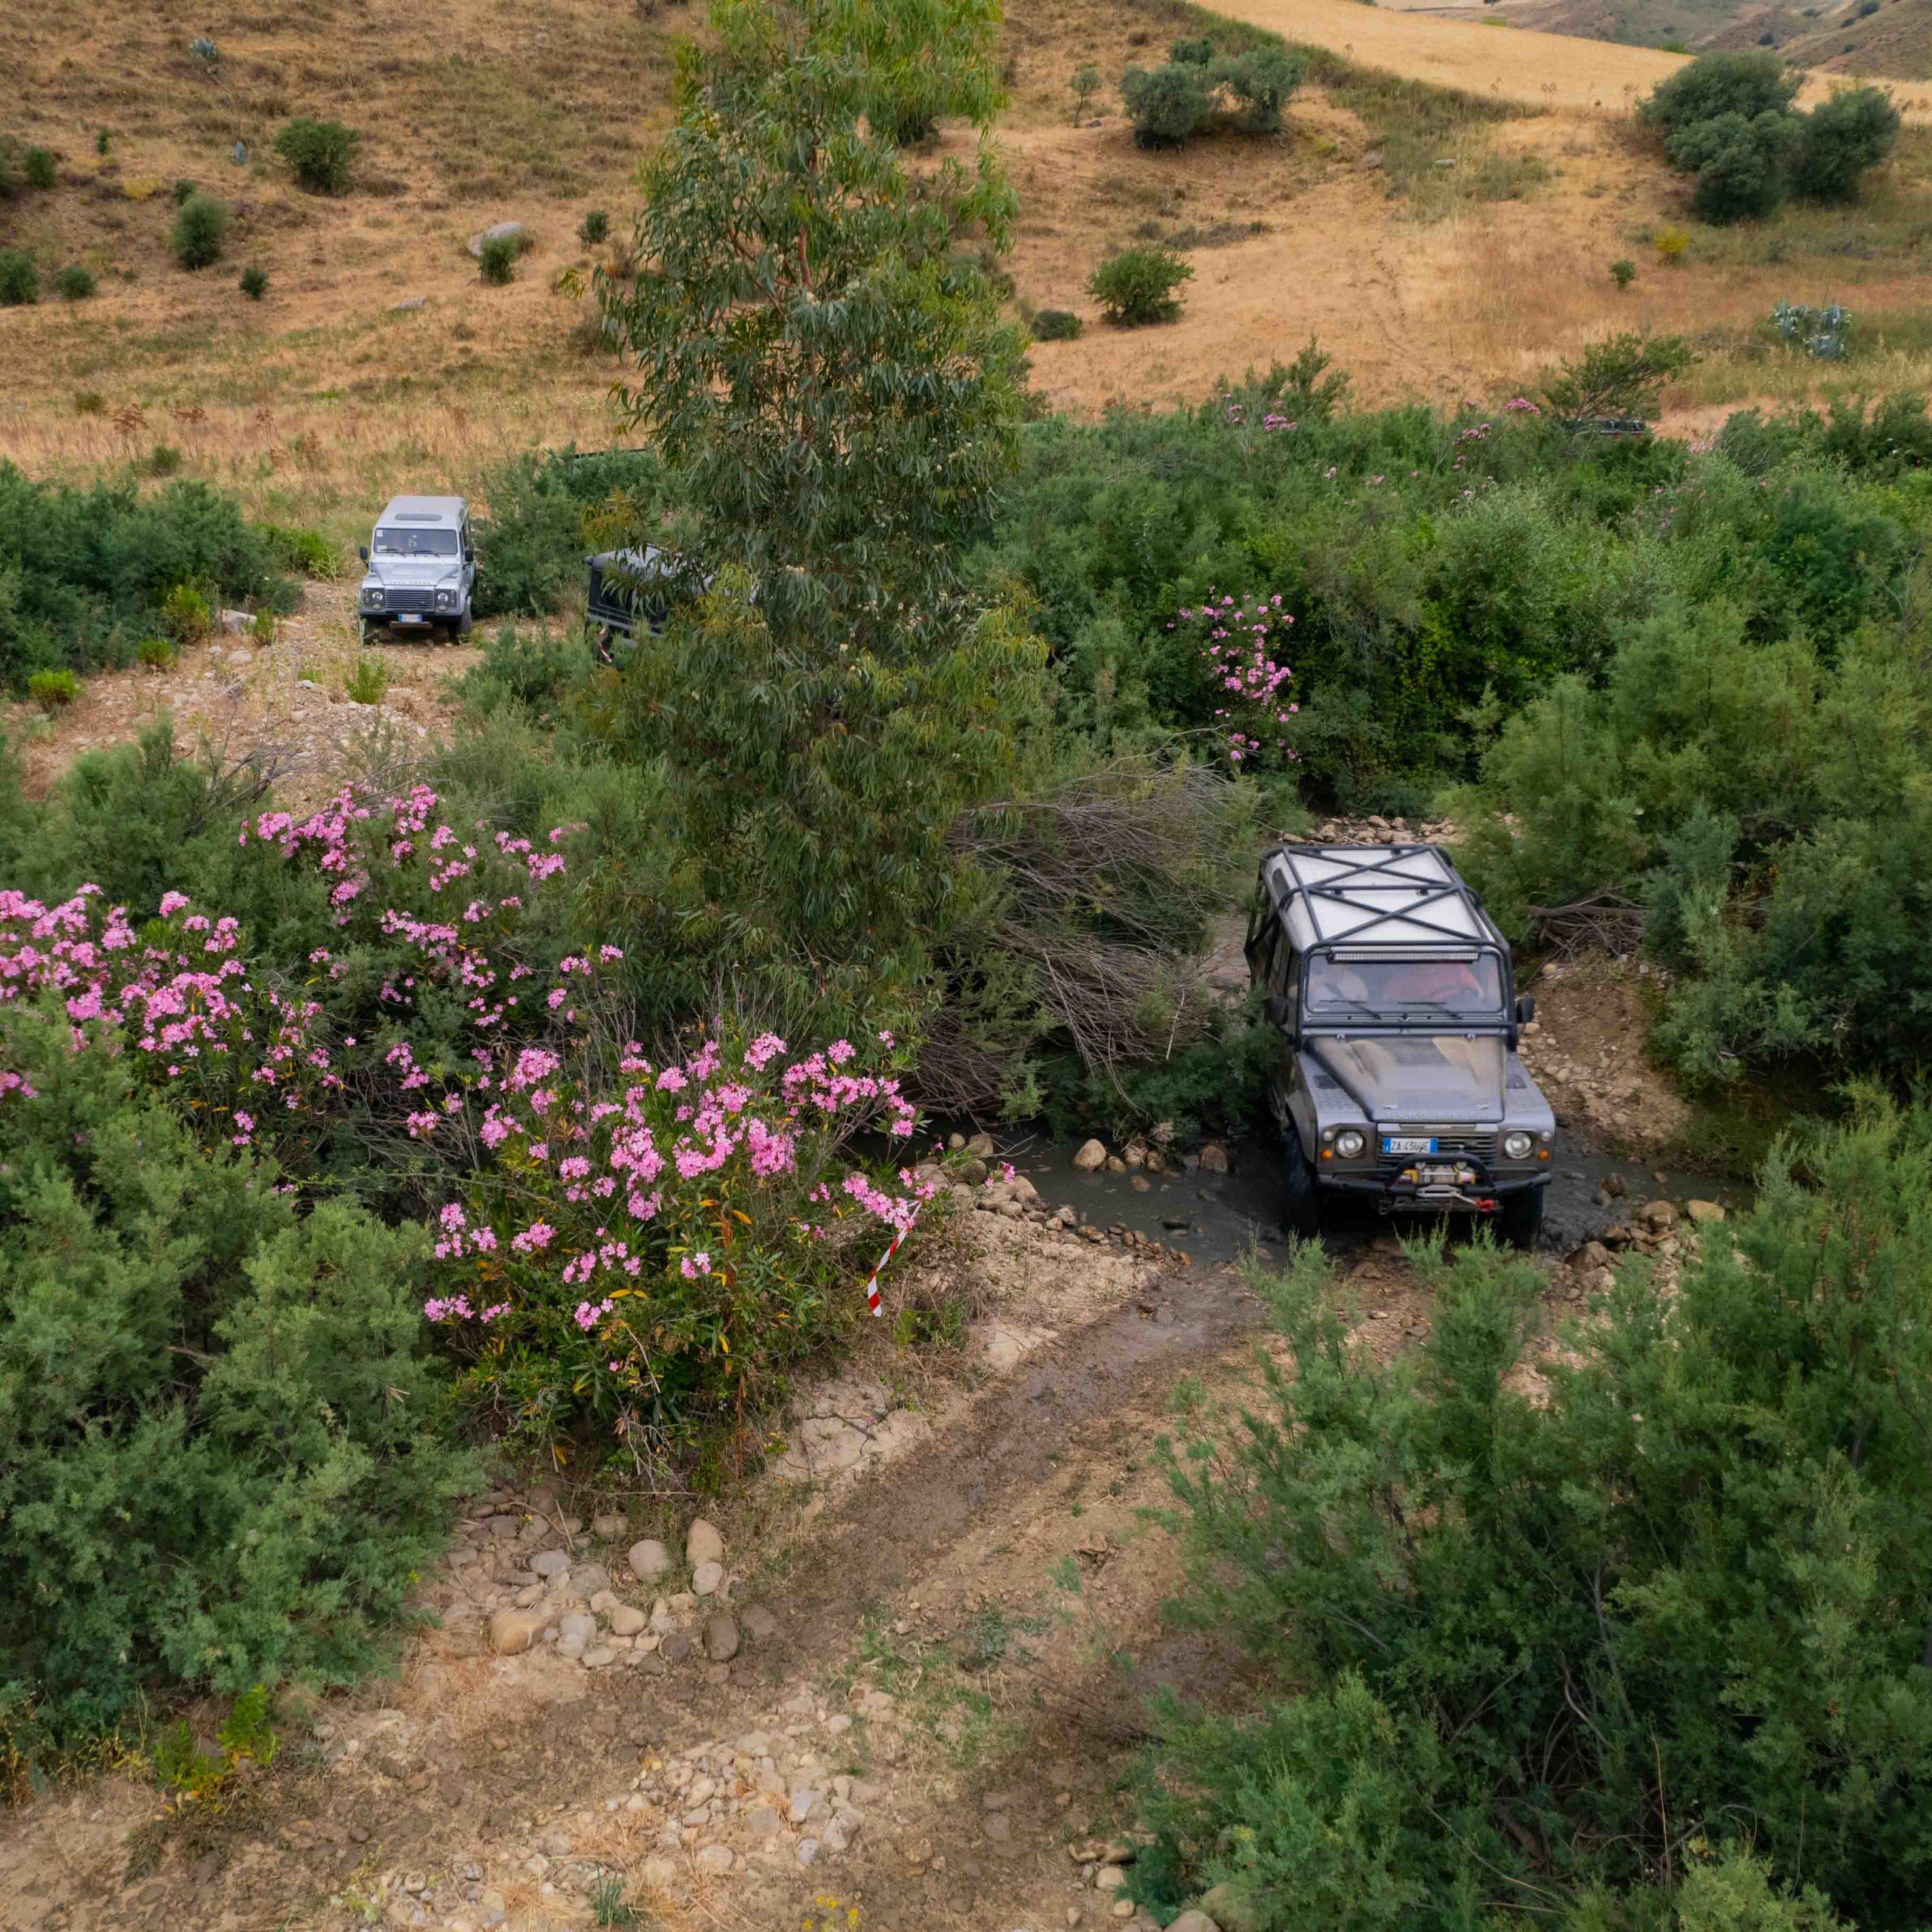 Land_Rover_Tour_Sicilia_2021_Land_Rover_Experience_Italia_-42